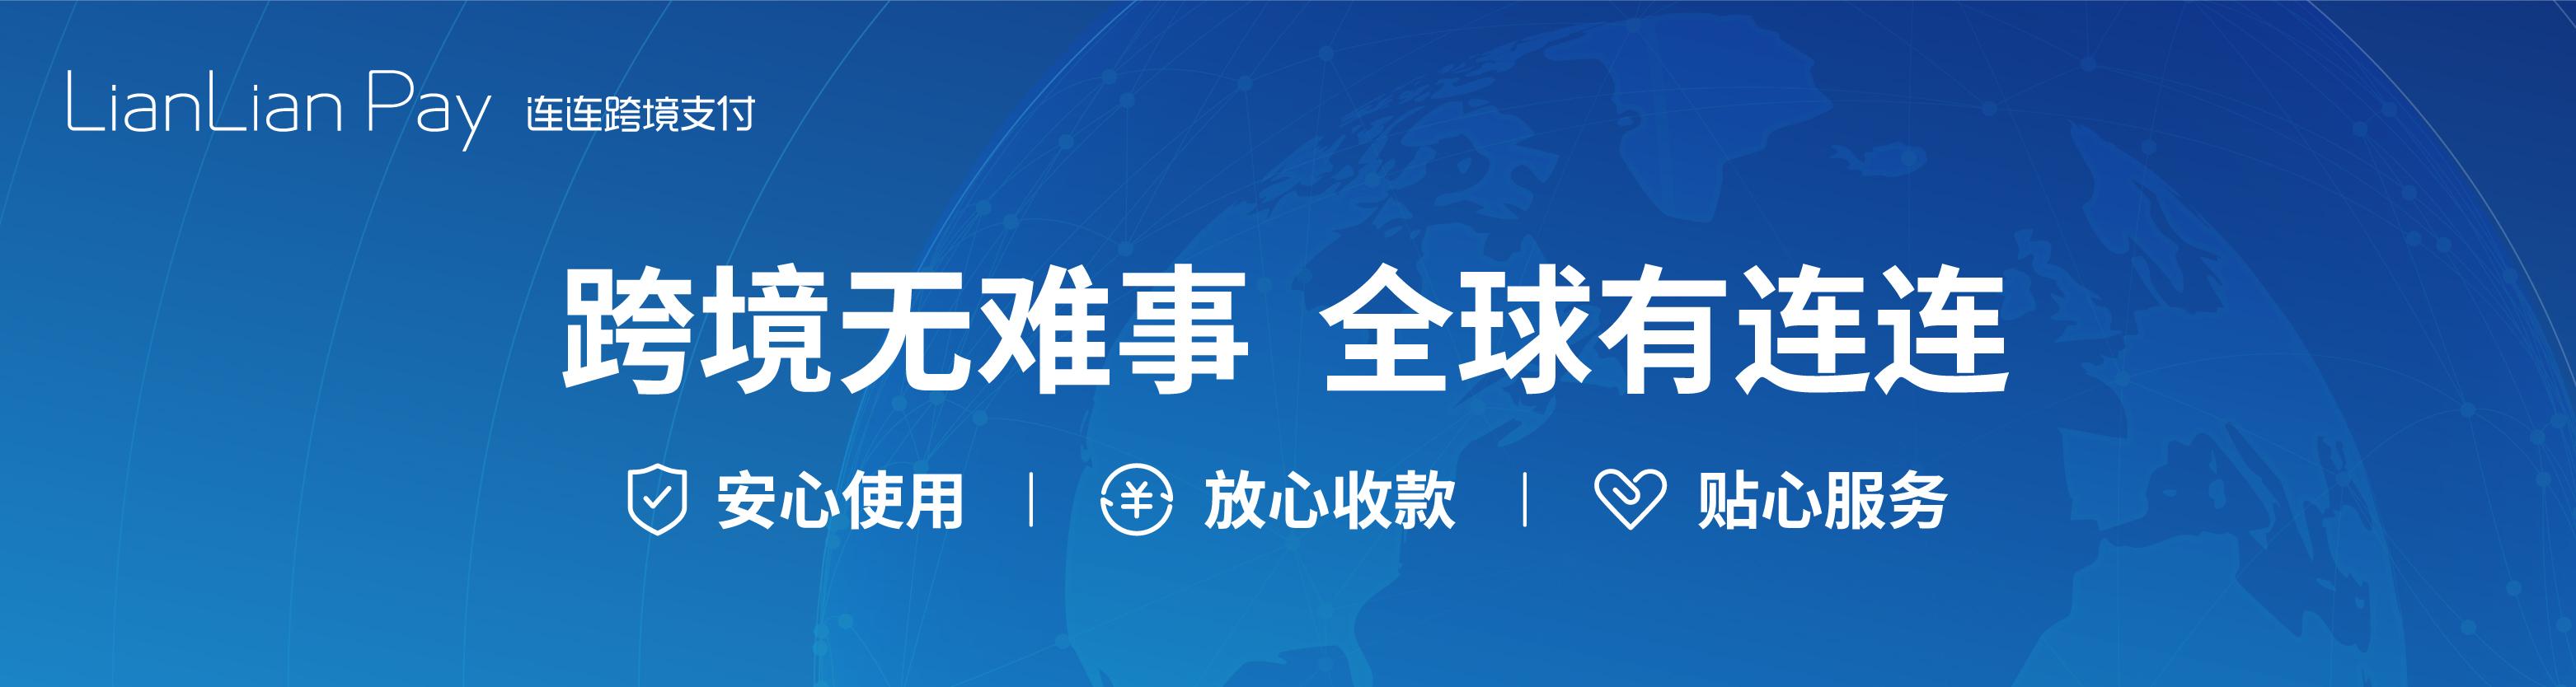 slogan_三心icon带logo.jpg